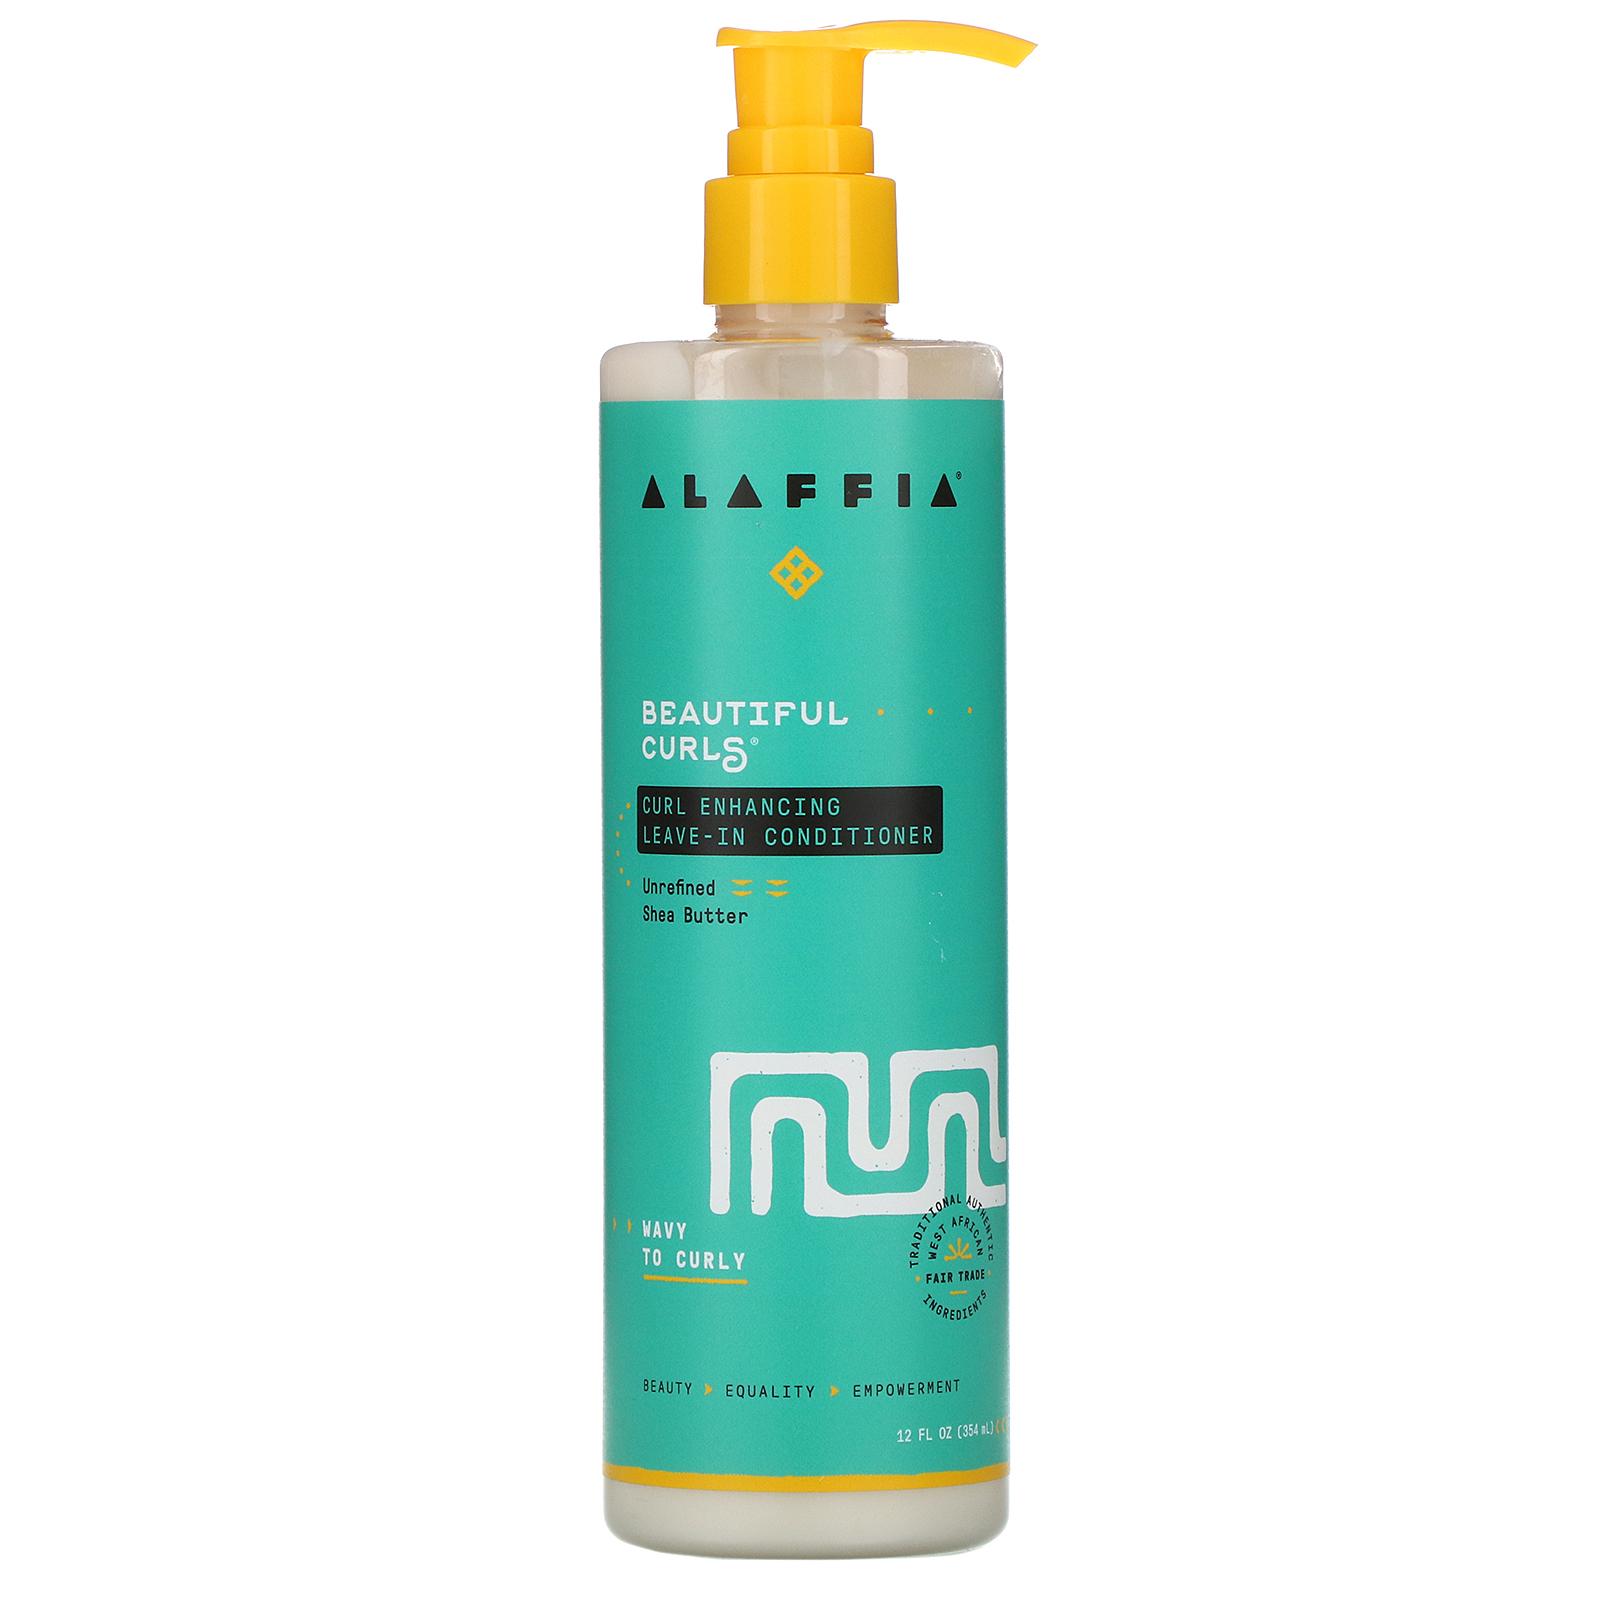 Alaffia, Beautiful Curls, Curl Enhancing Leave In Conditioner ...